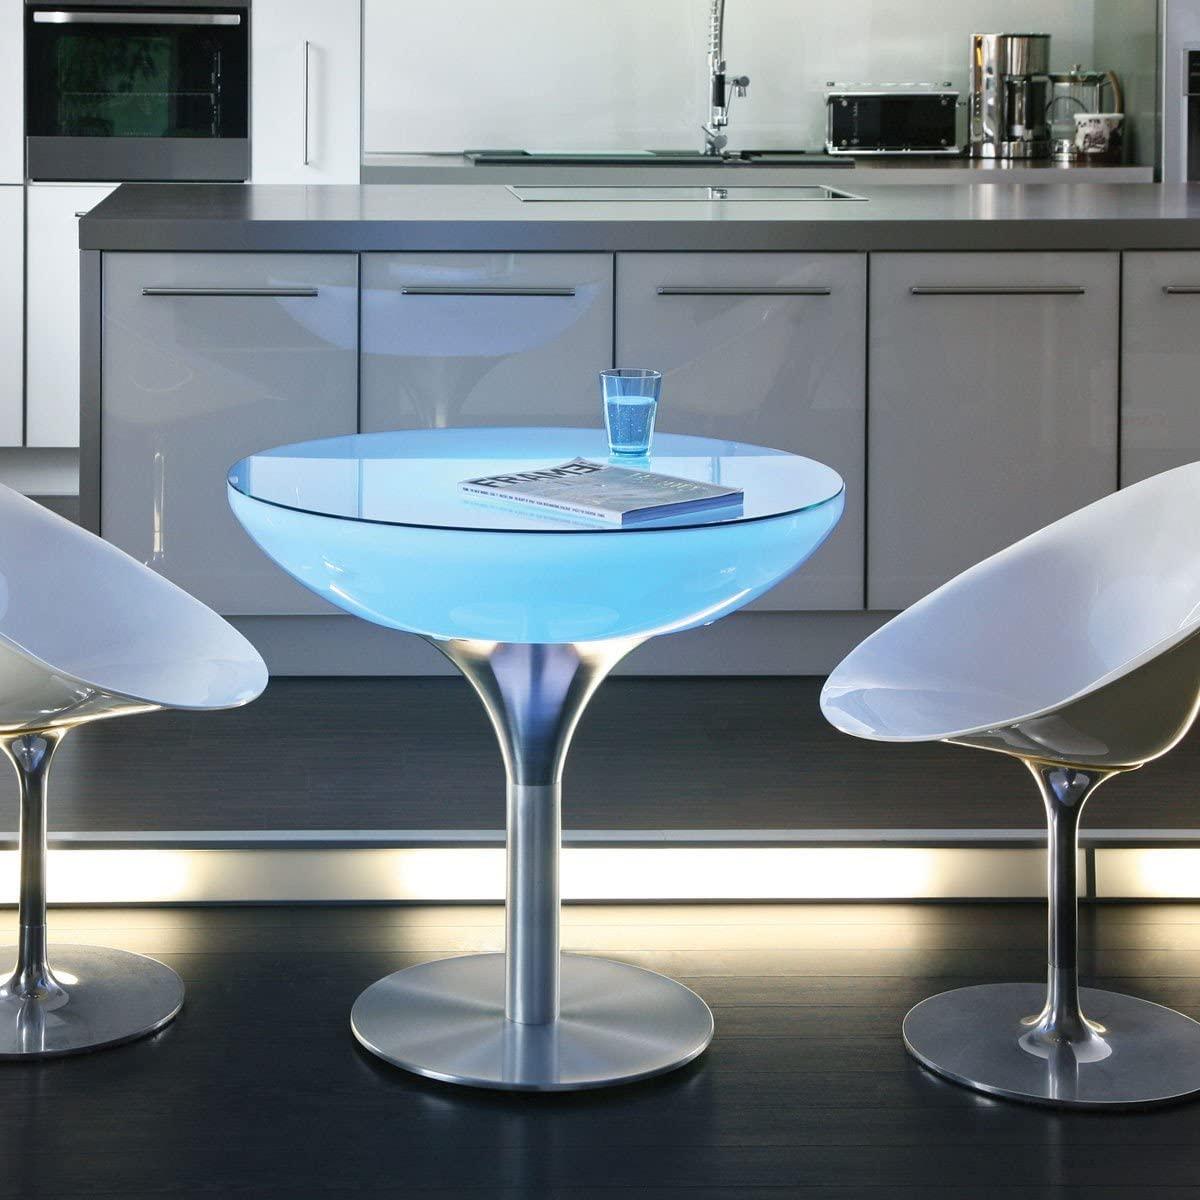 Lounge mesa 75LED PRO mesa de comedor opalino/chasis aluminio/Brushed Anodized/Ø x H: 84x 75cm/12programas & 29colores/con mando a distancia IR